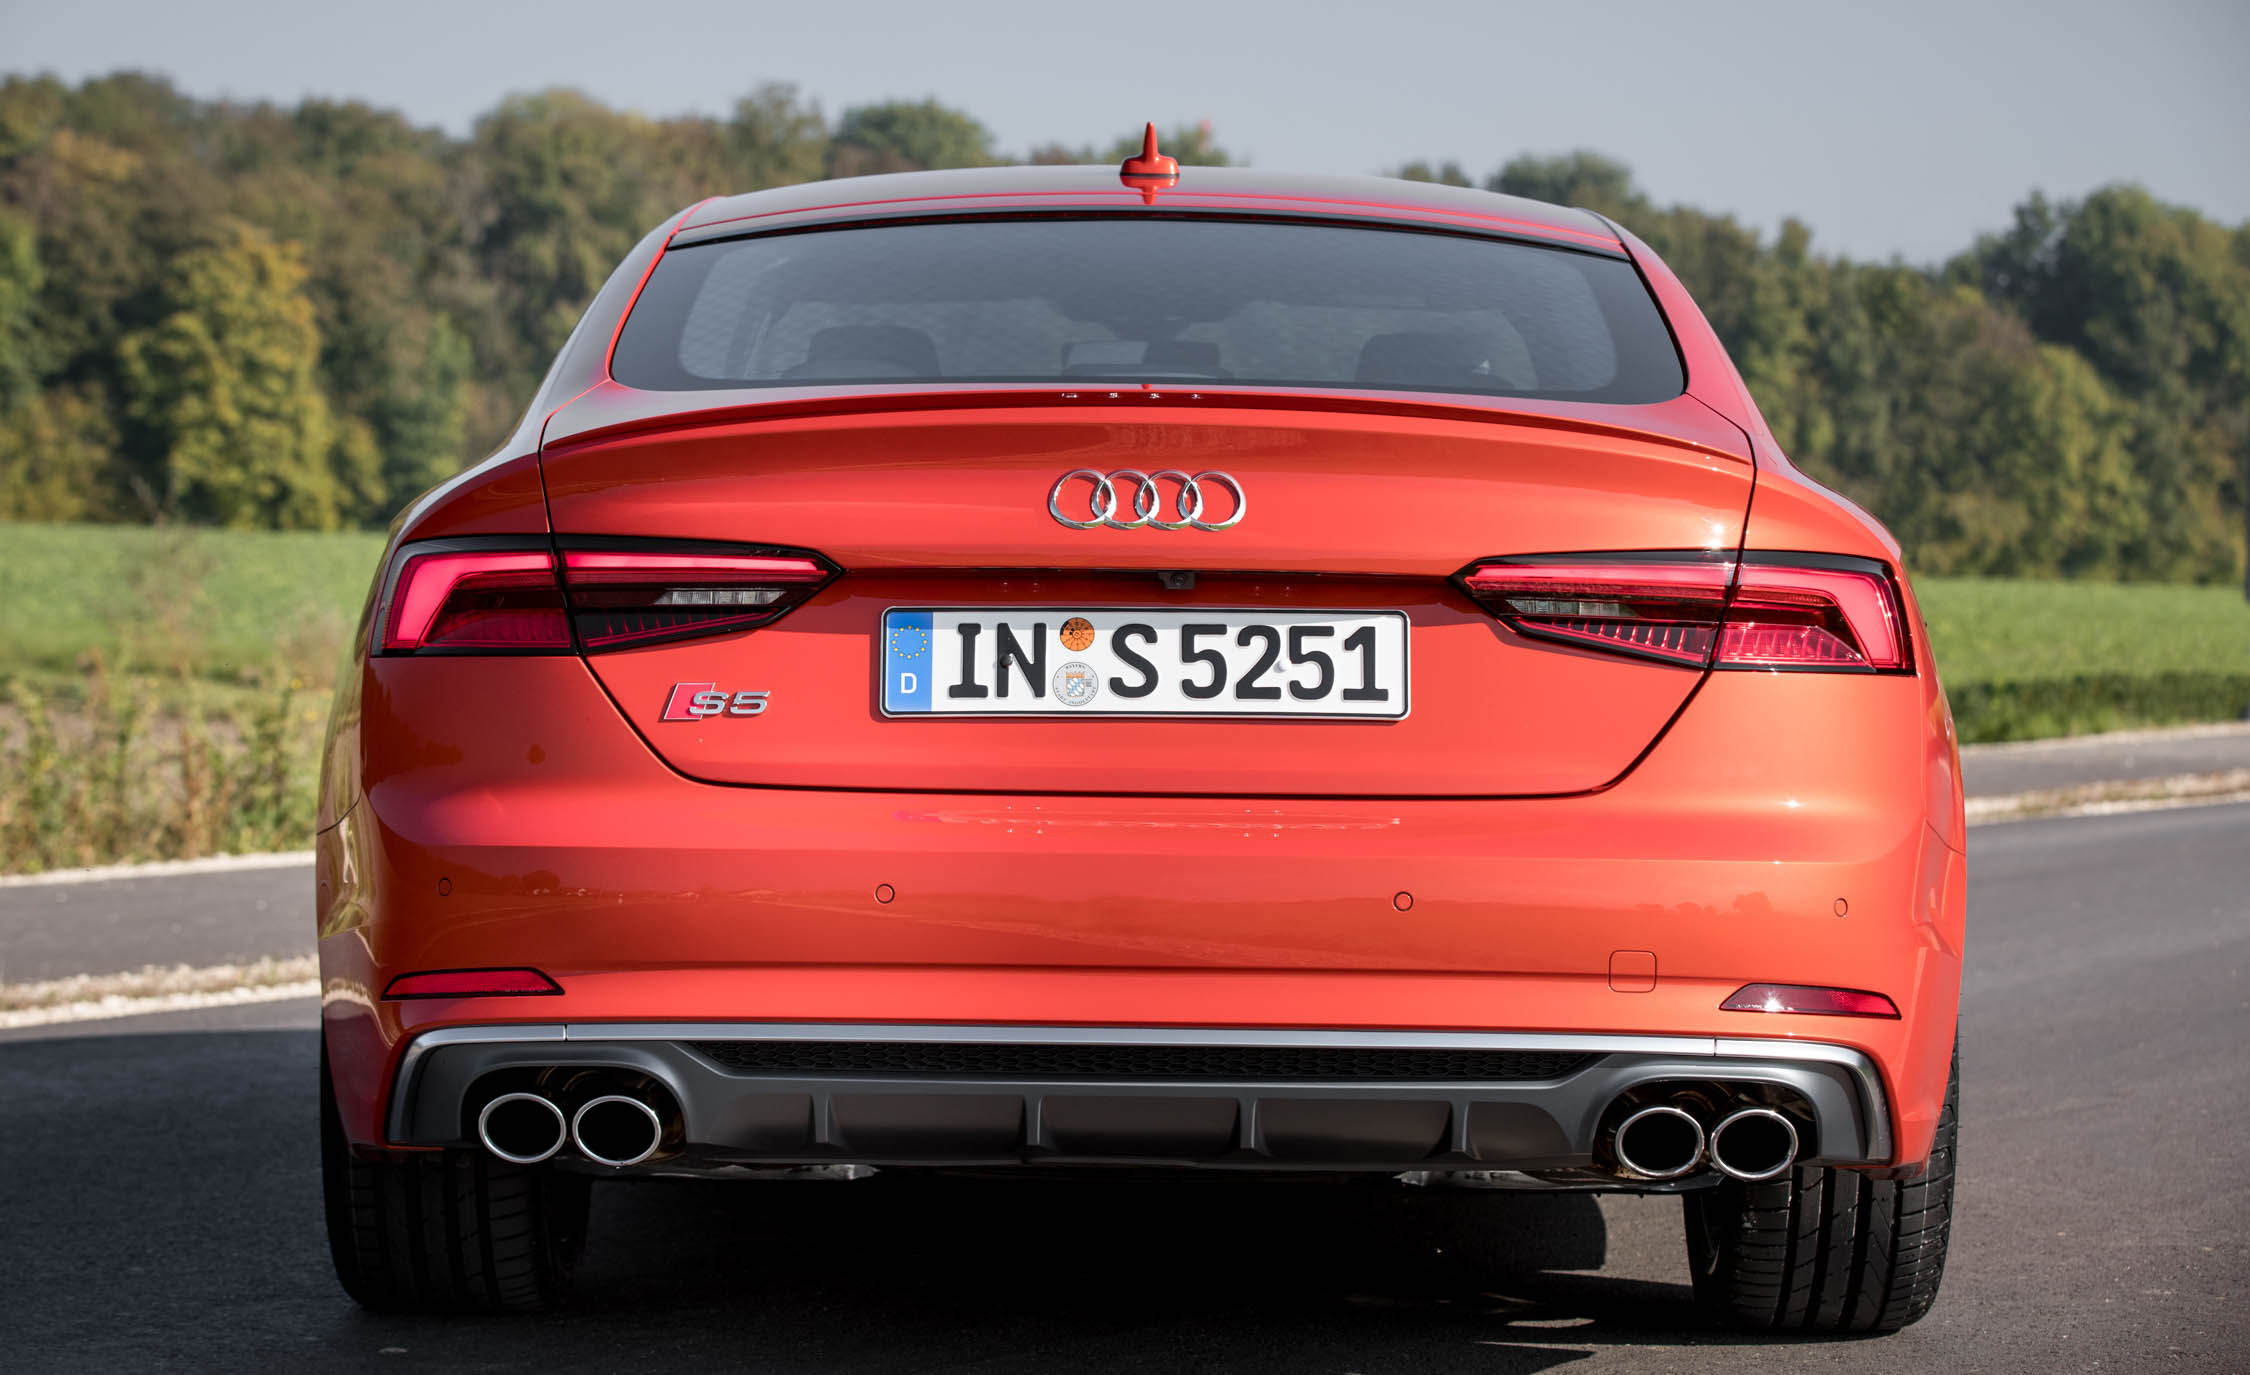 2017 Audi S5 Sportback (View 7 of 10)